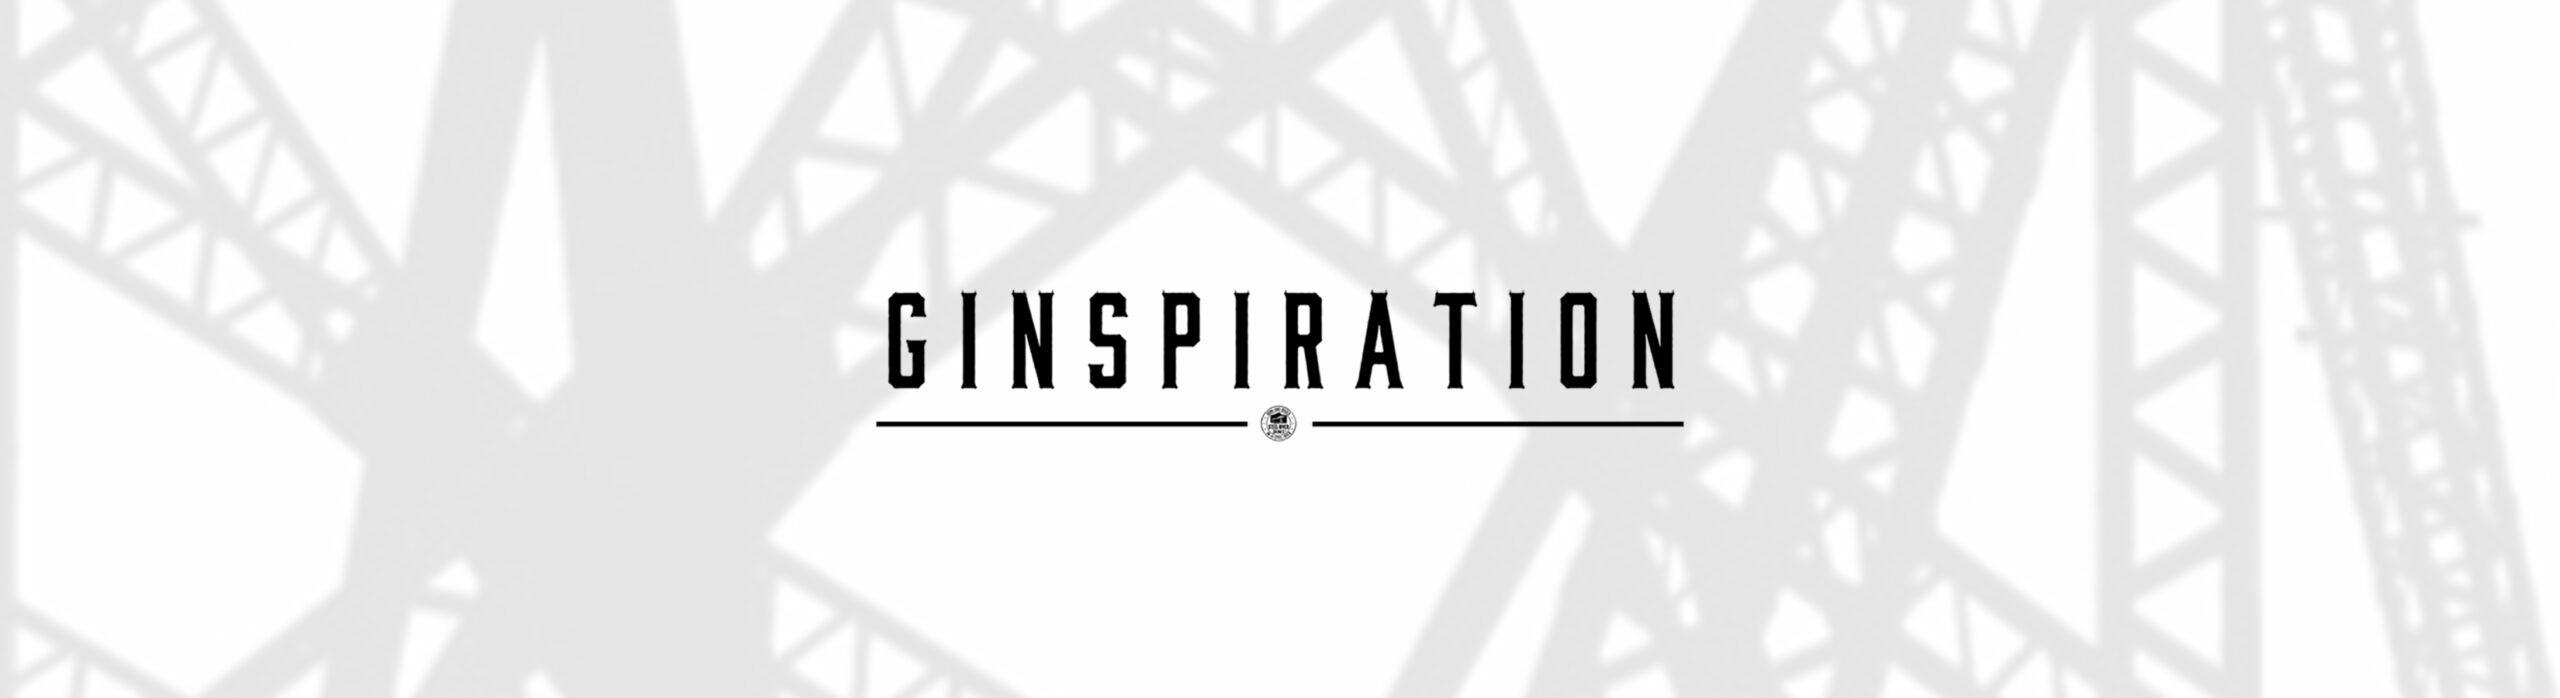 Ginspiration Title Banner